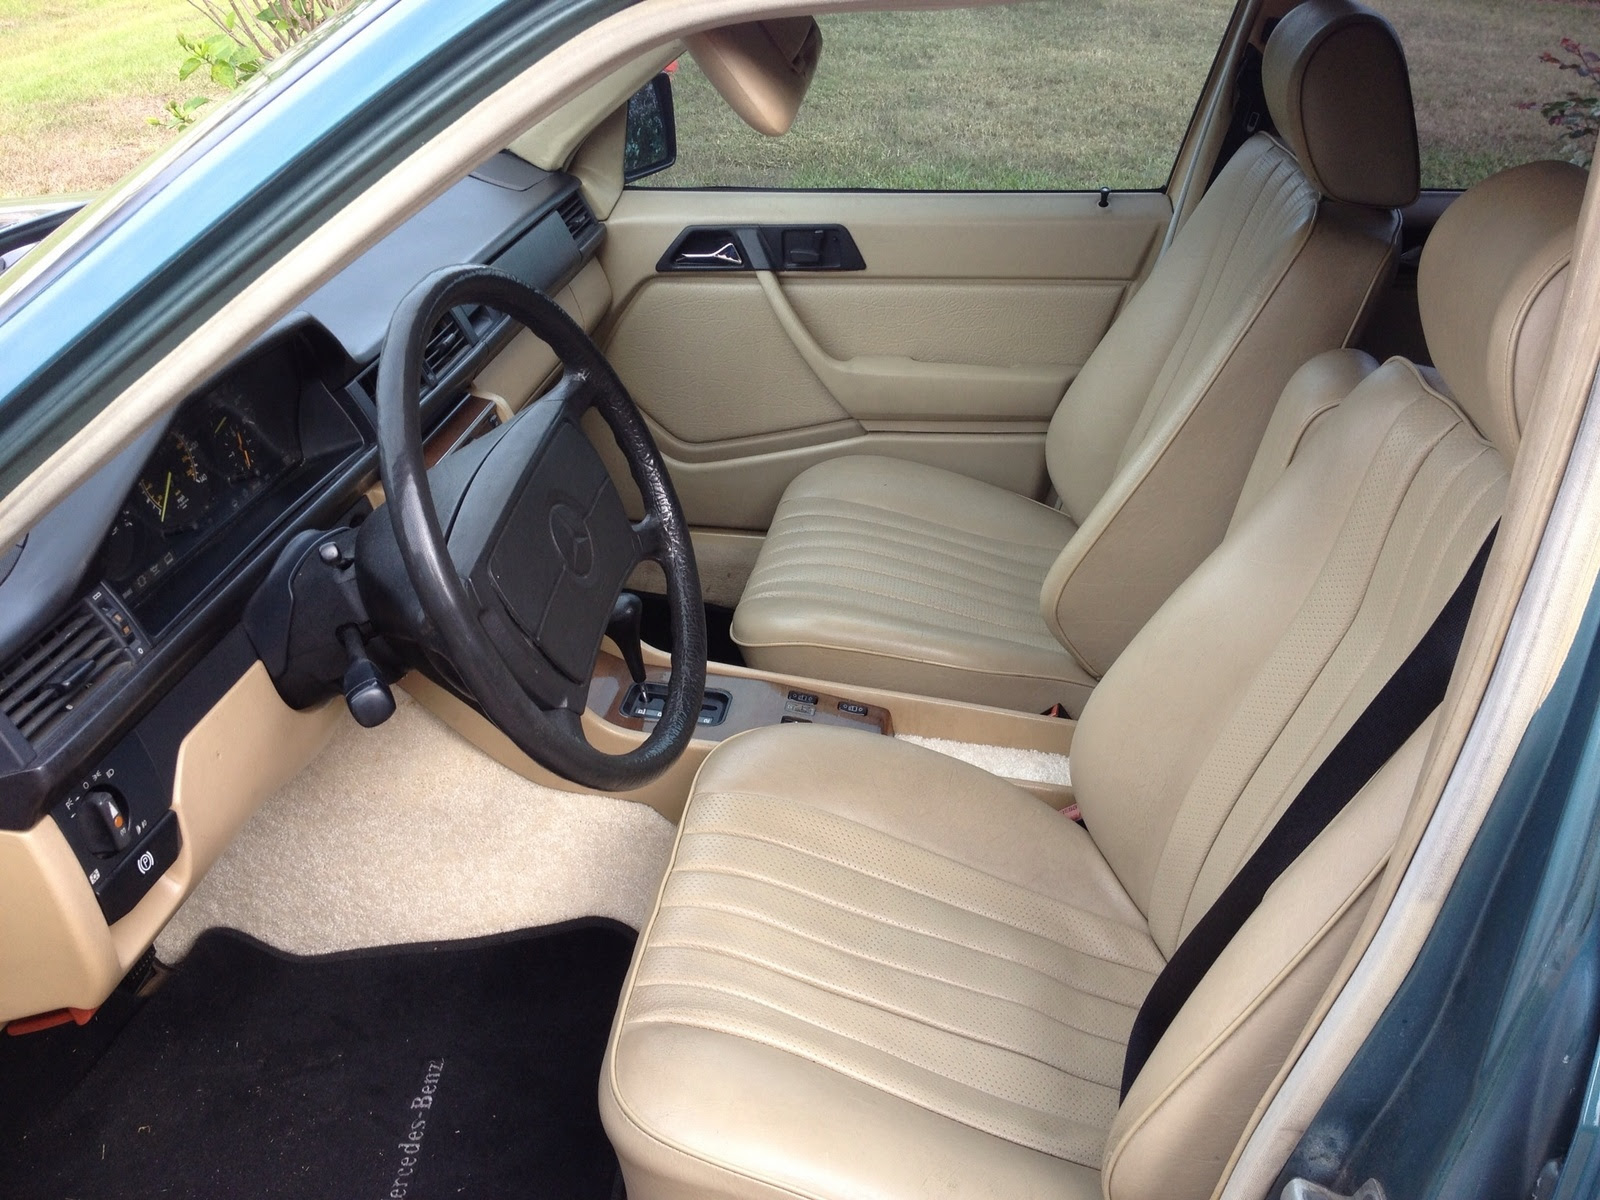 1987 Mercedes-Benz 300-Class - Pictures - CarGurus